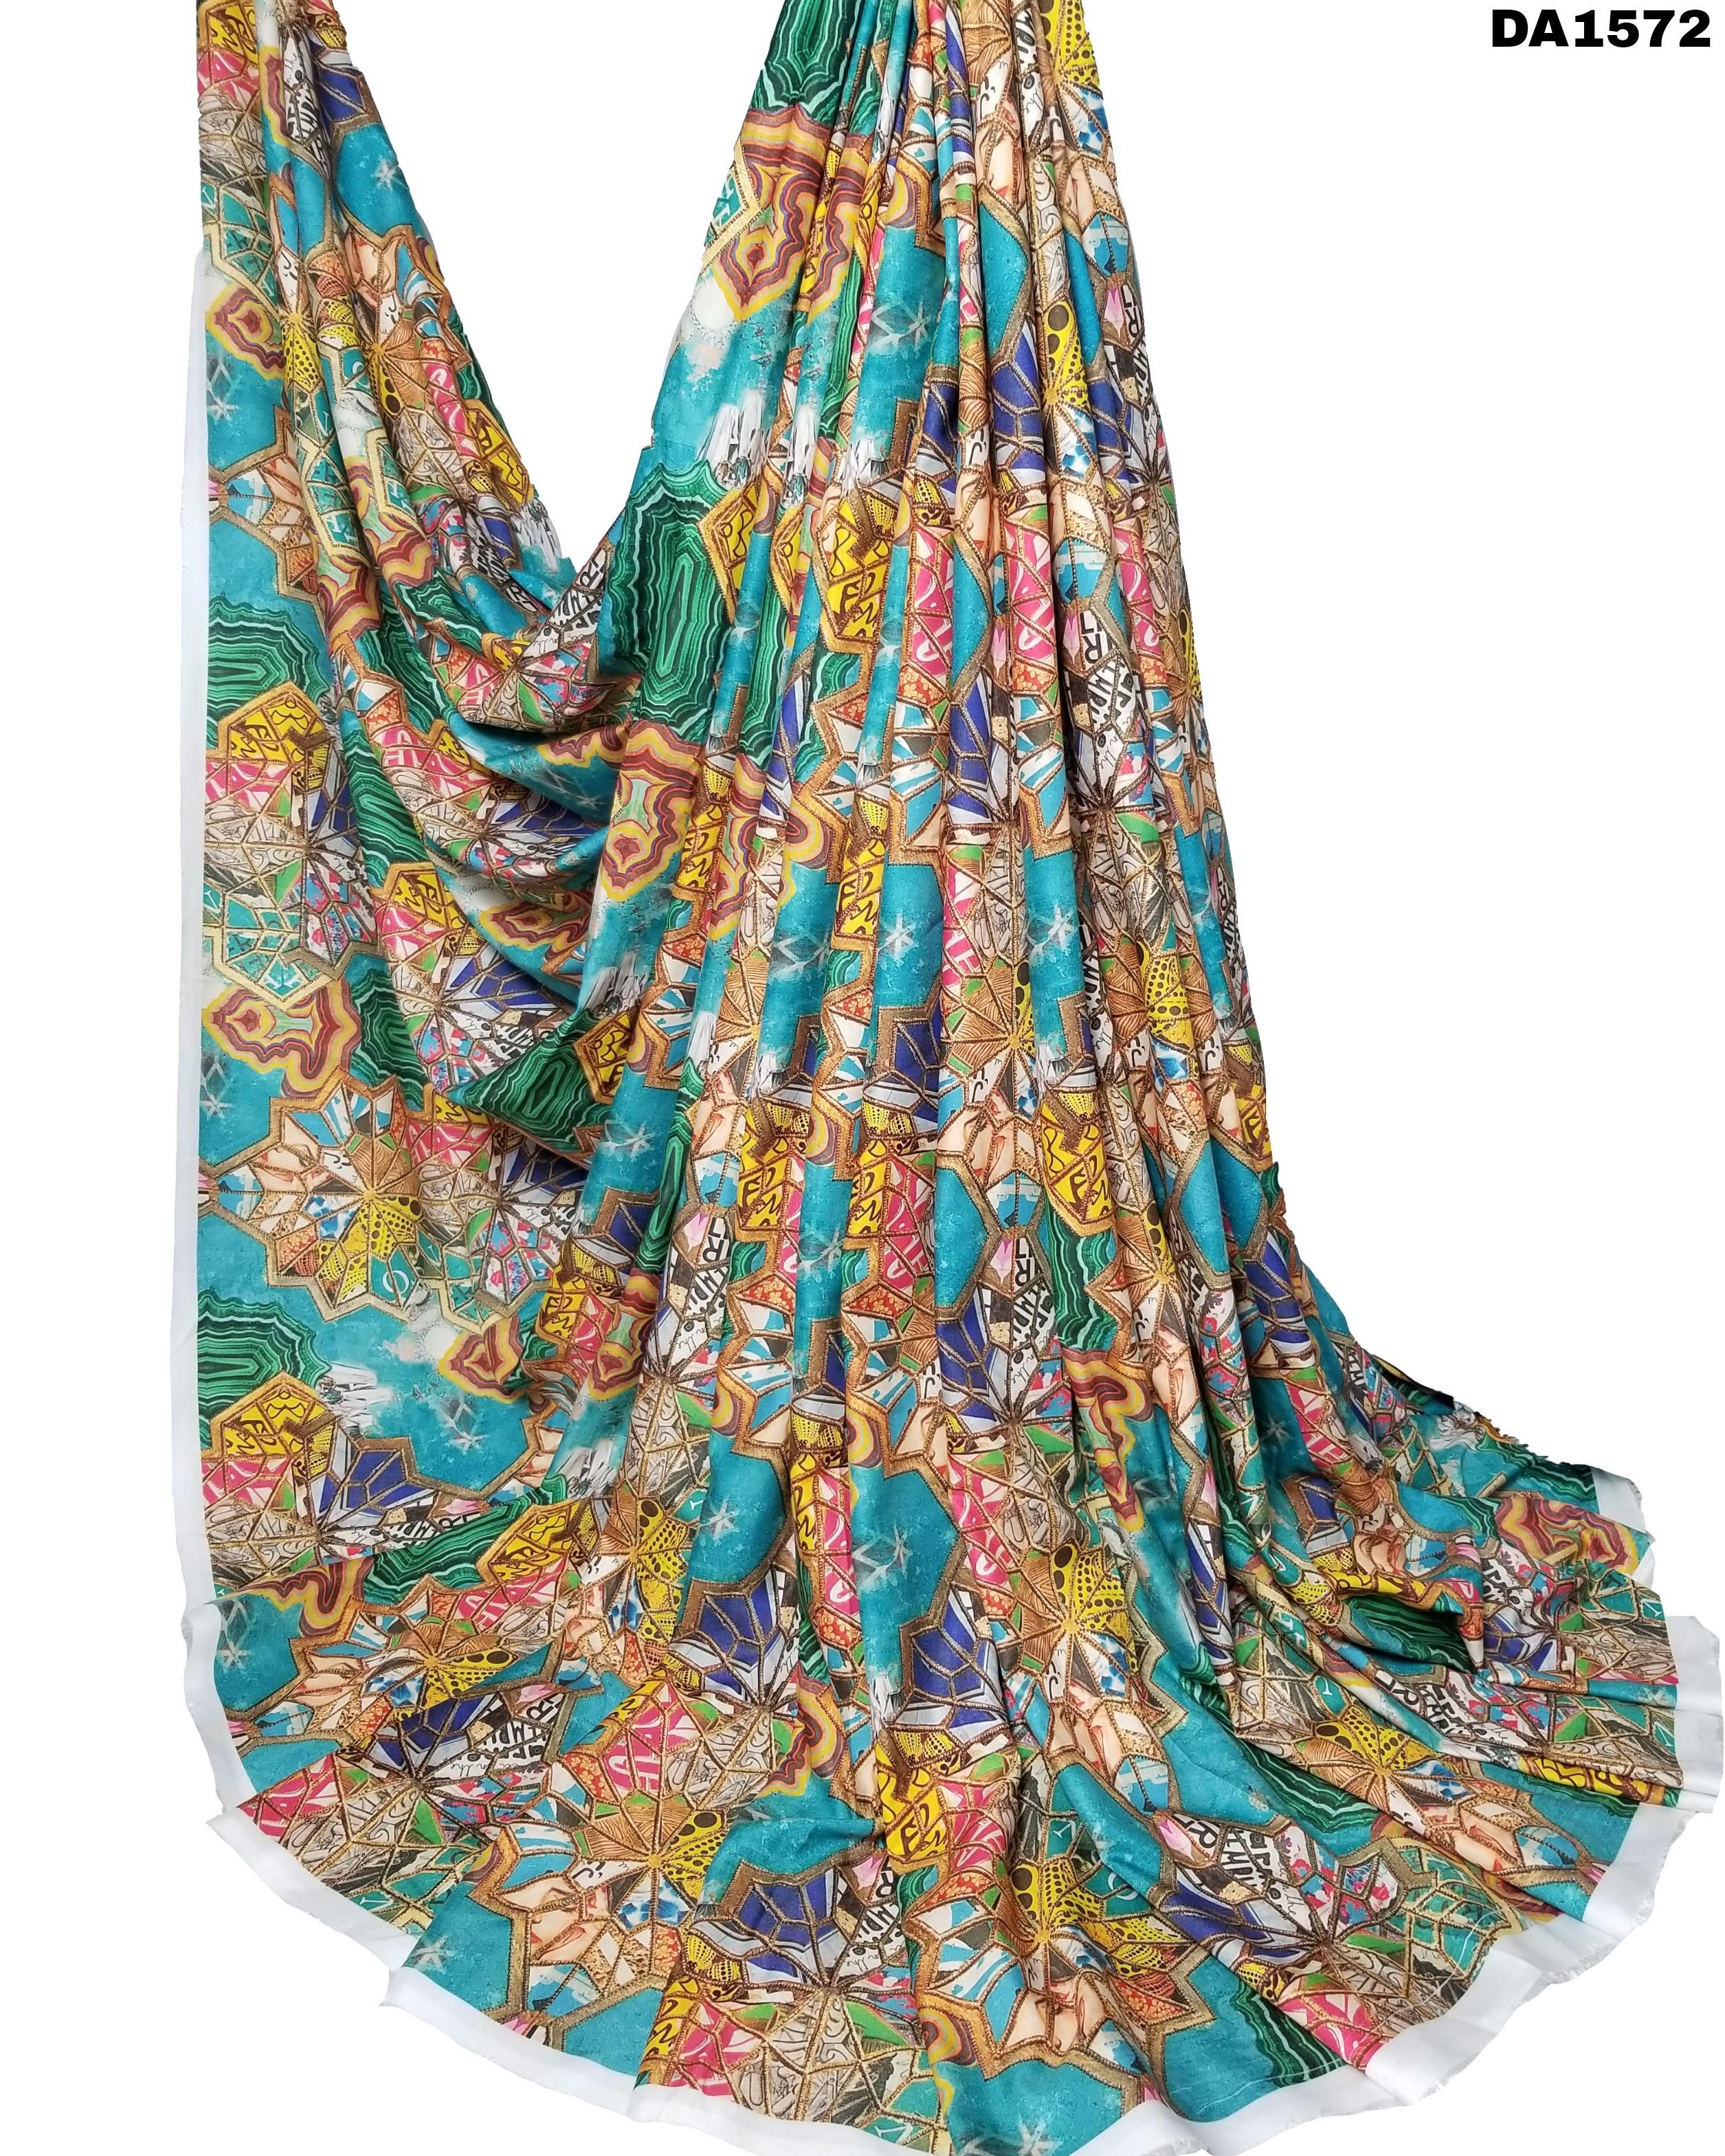 Multicolored Digital Print Design On Rayon Silk Fabric